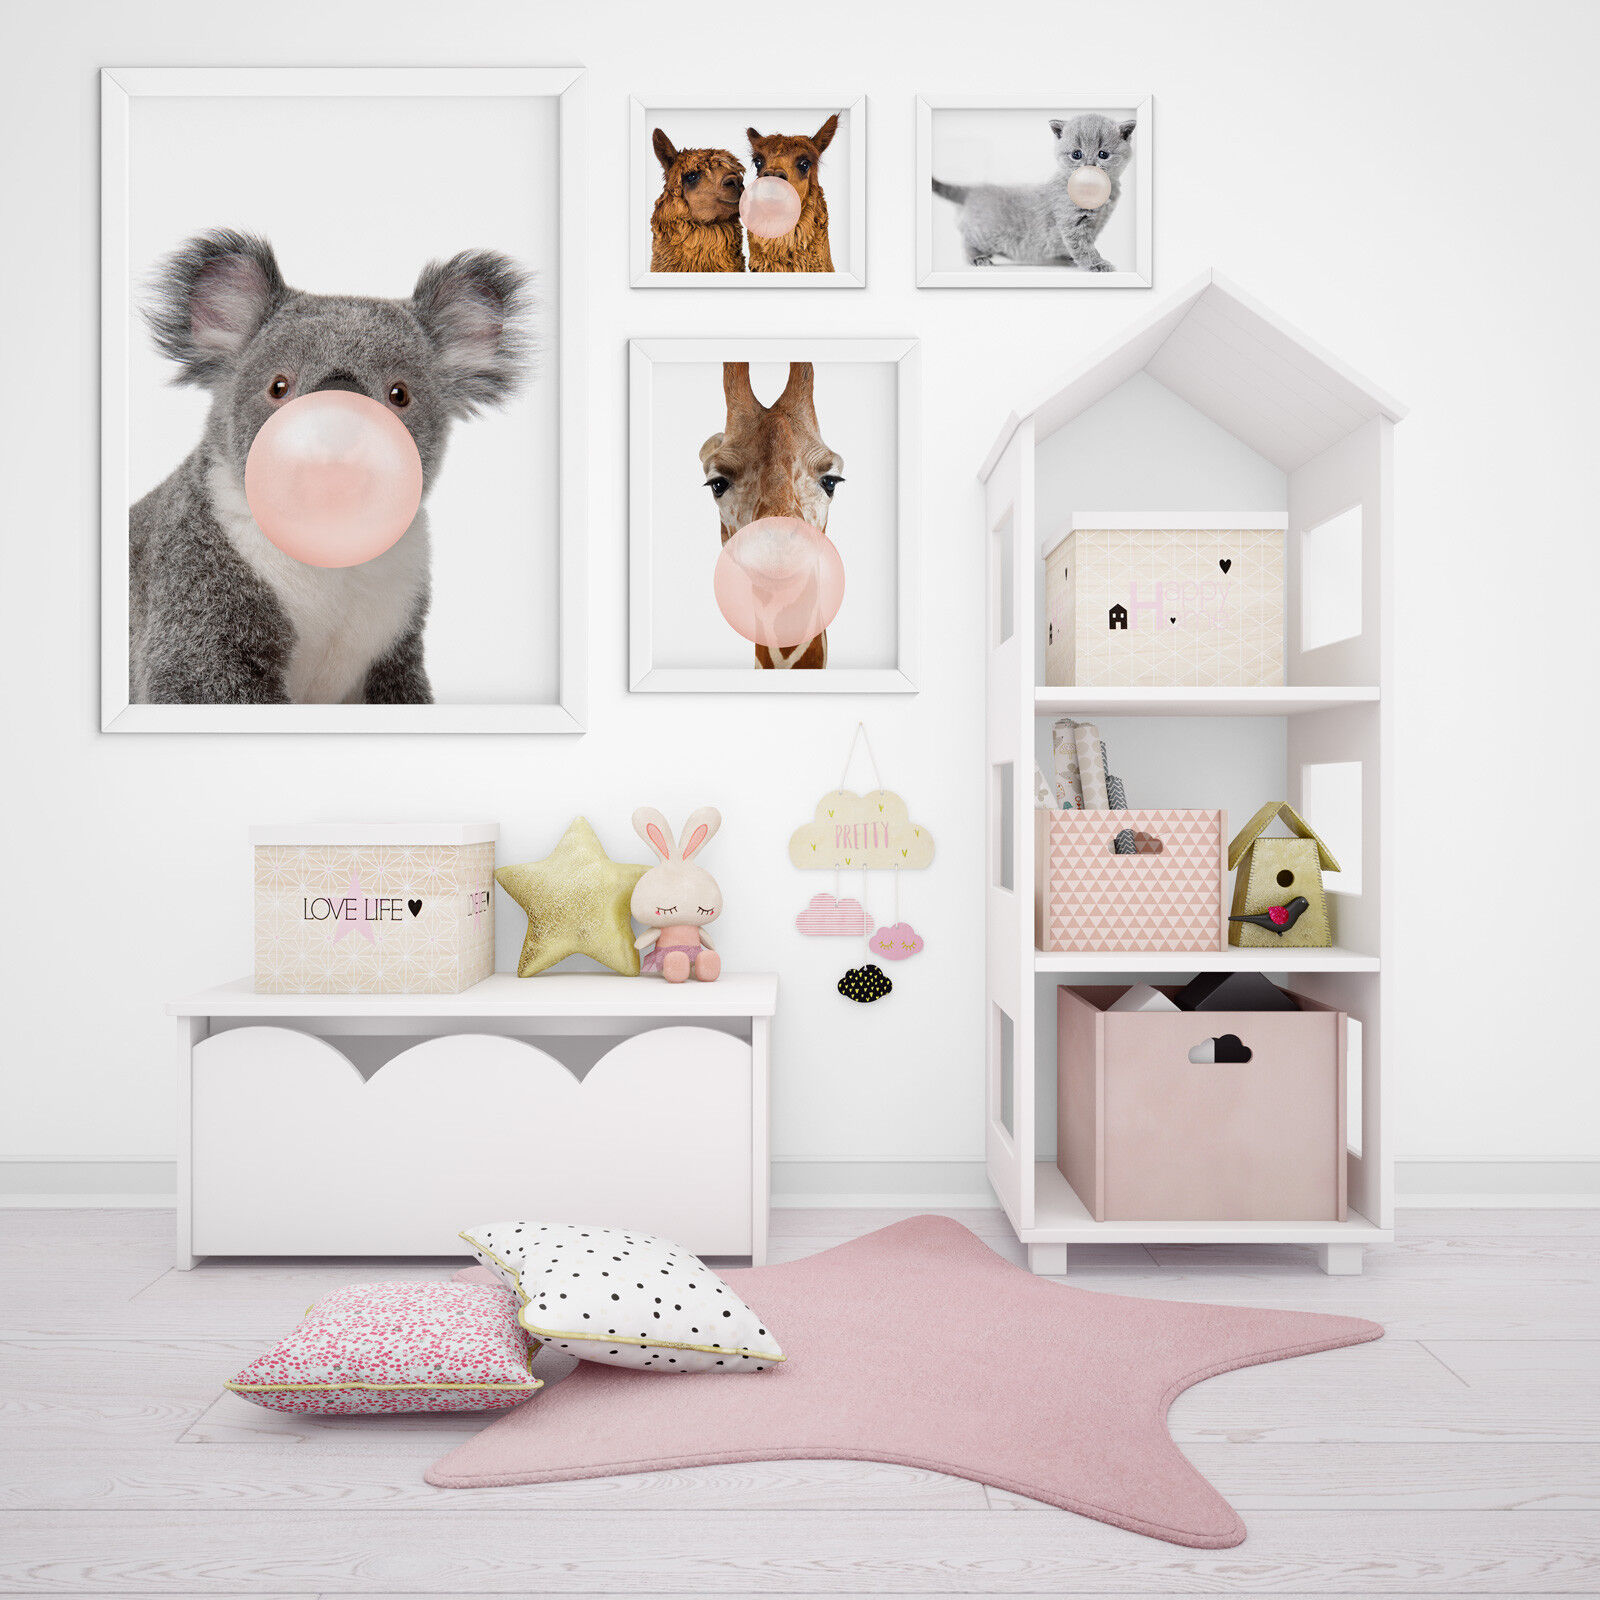 designbomb® Lustige Tiere mit Kaugummi Baby & Kinderzimmer Poster / Plakate